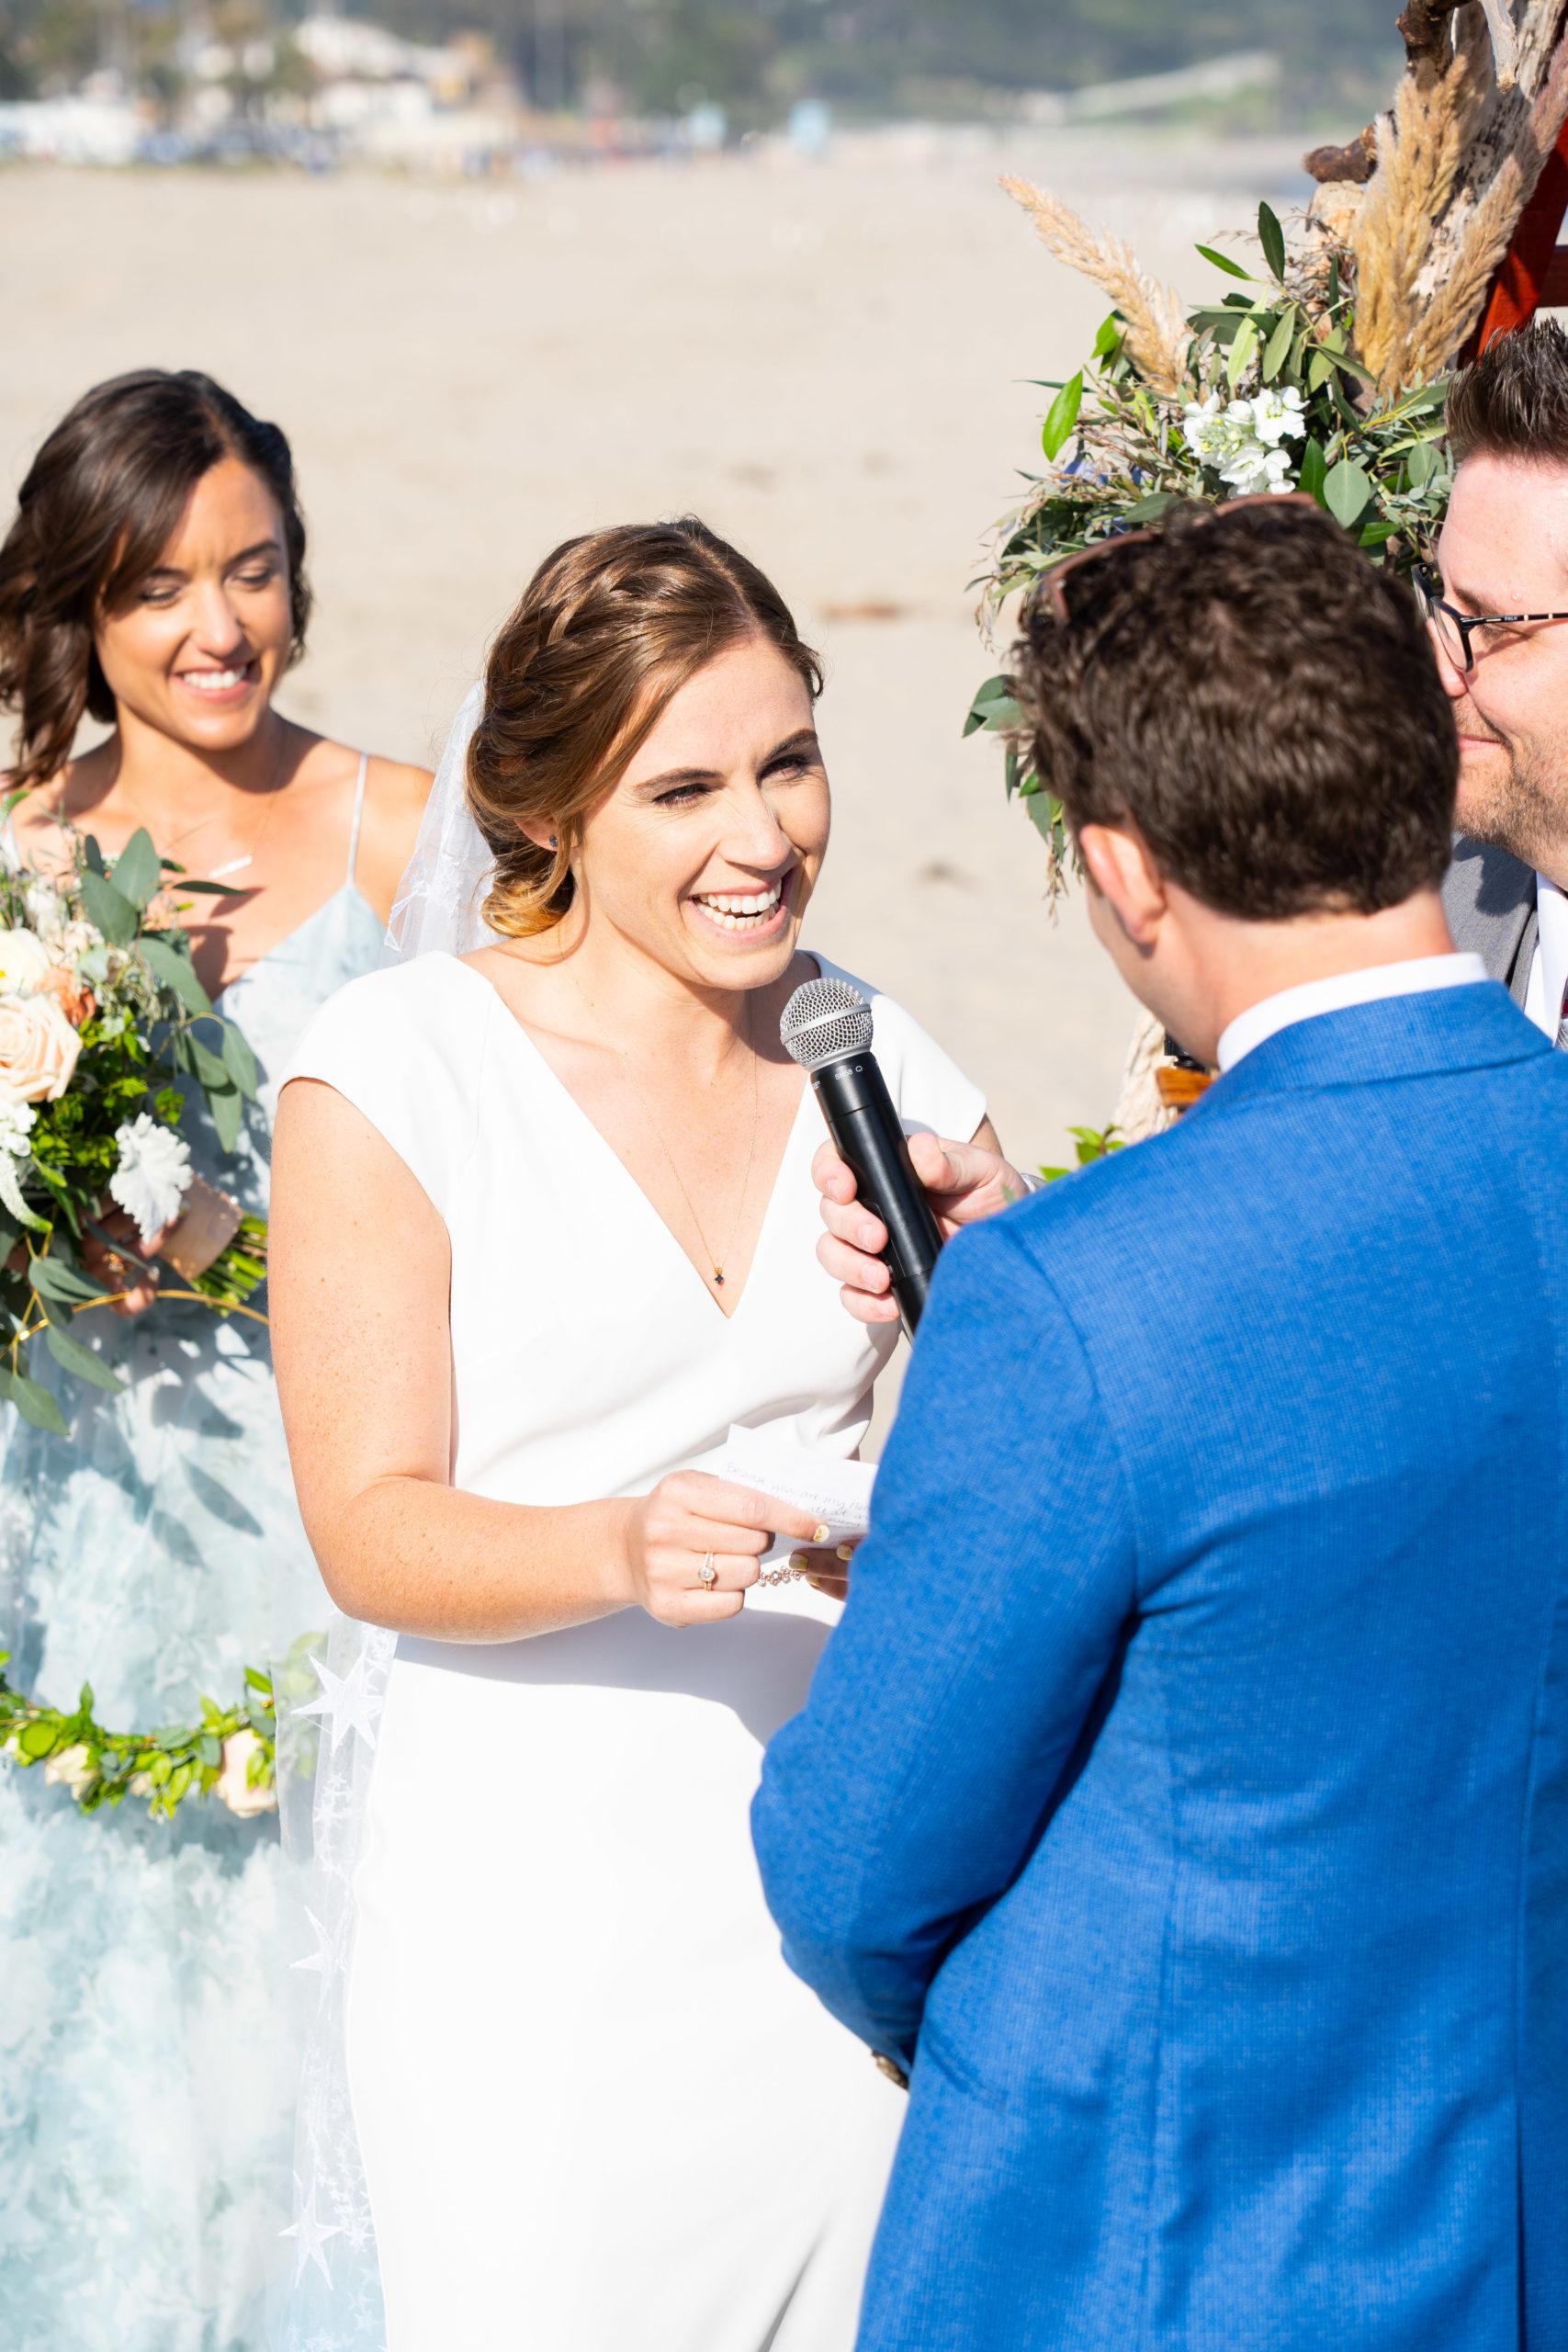 Bride's vows at ceremony